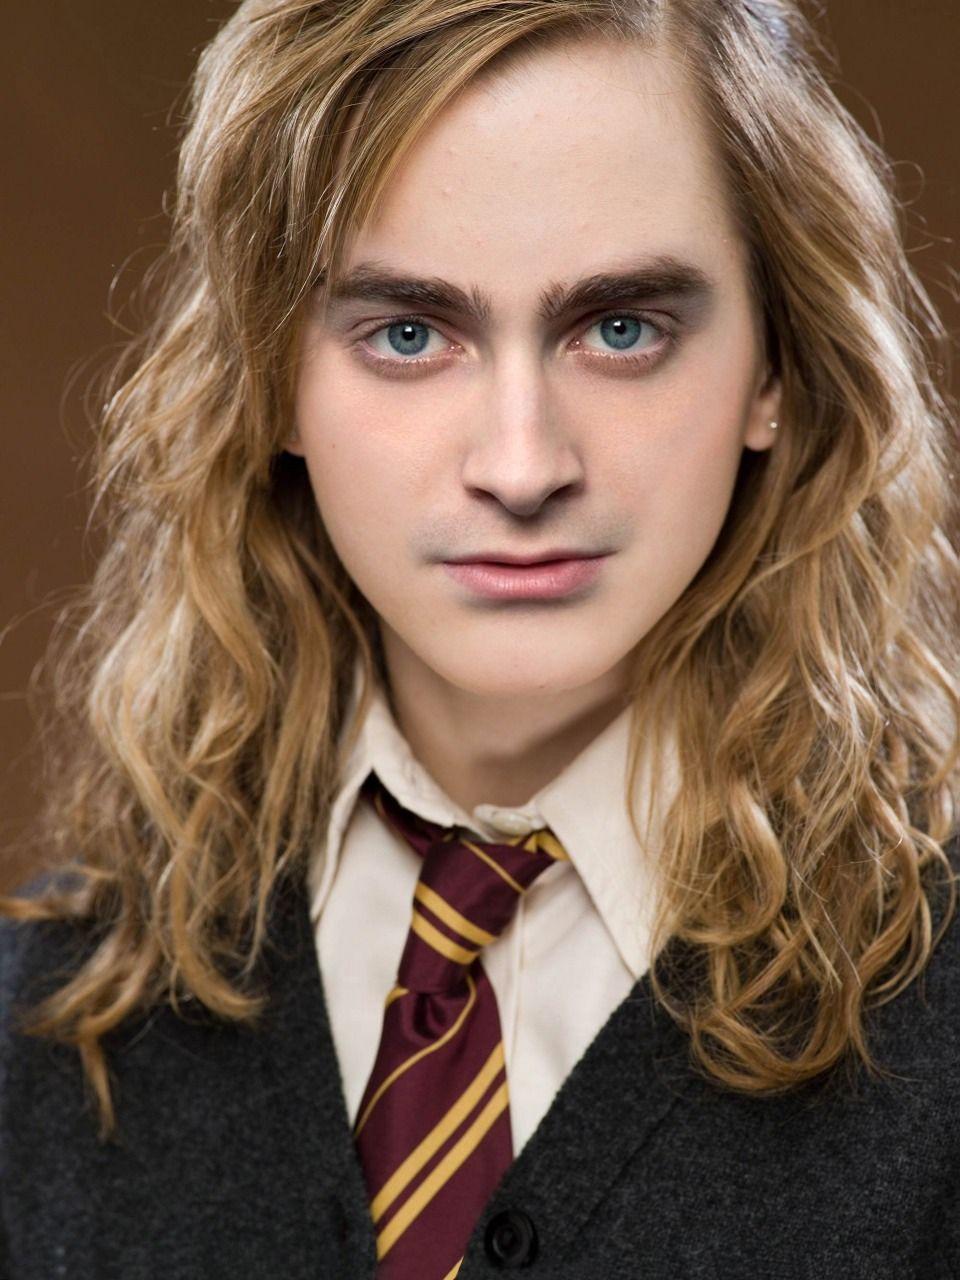 Hermione Granger / Harry Potter Harry Potter Ema